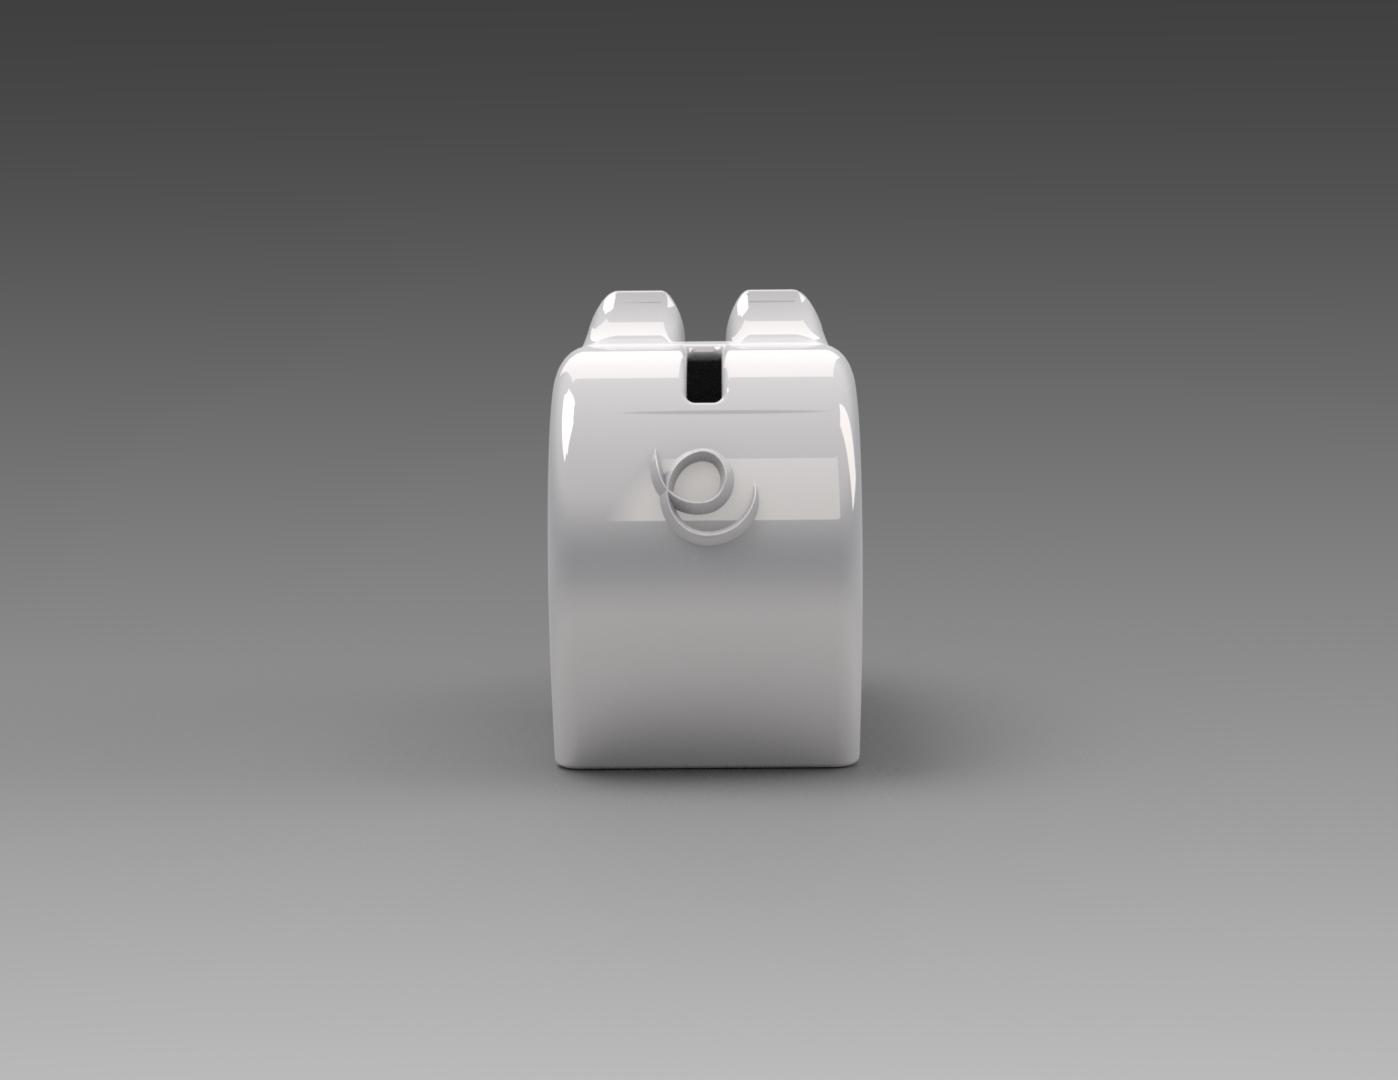 Minty Render, Designed by Kamal Peshawaria